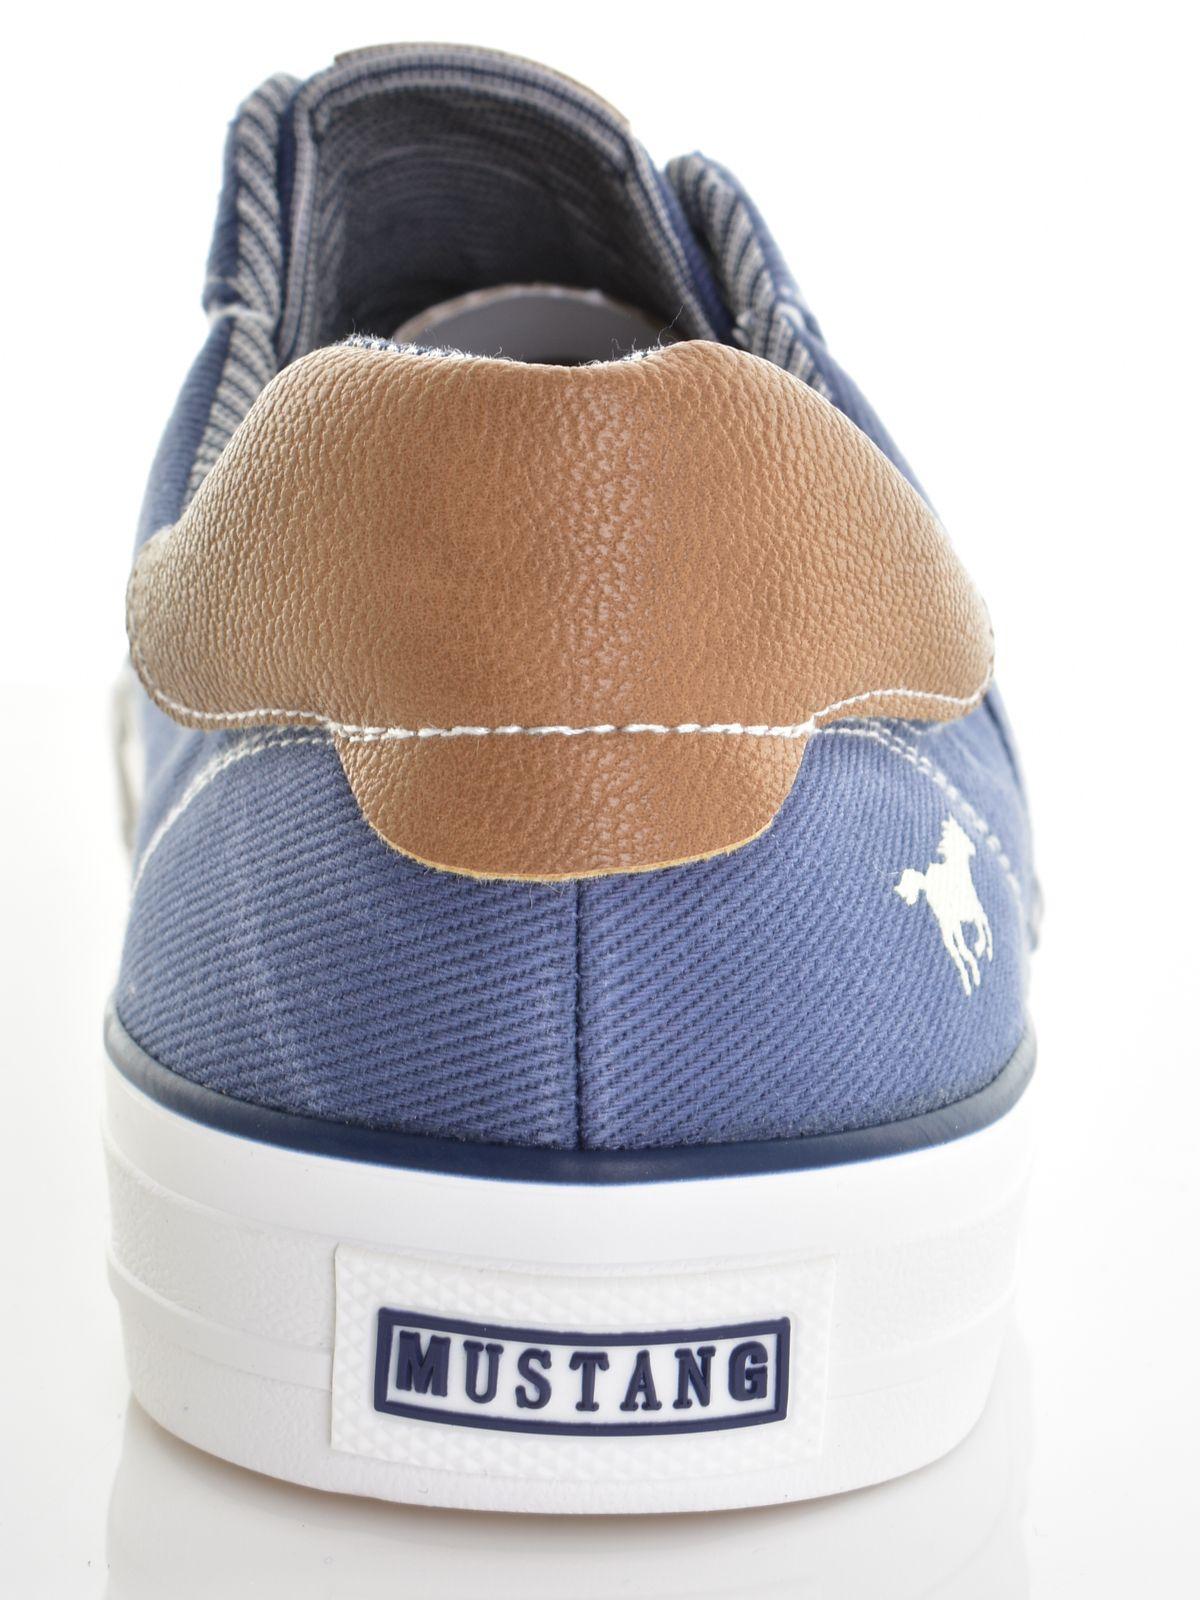 Mustang férfi cipő · Mustang férfi cipő ... d2bfbc42ba